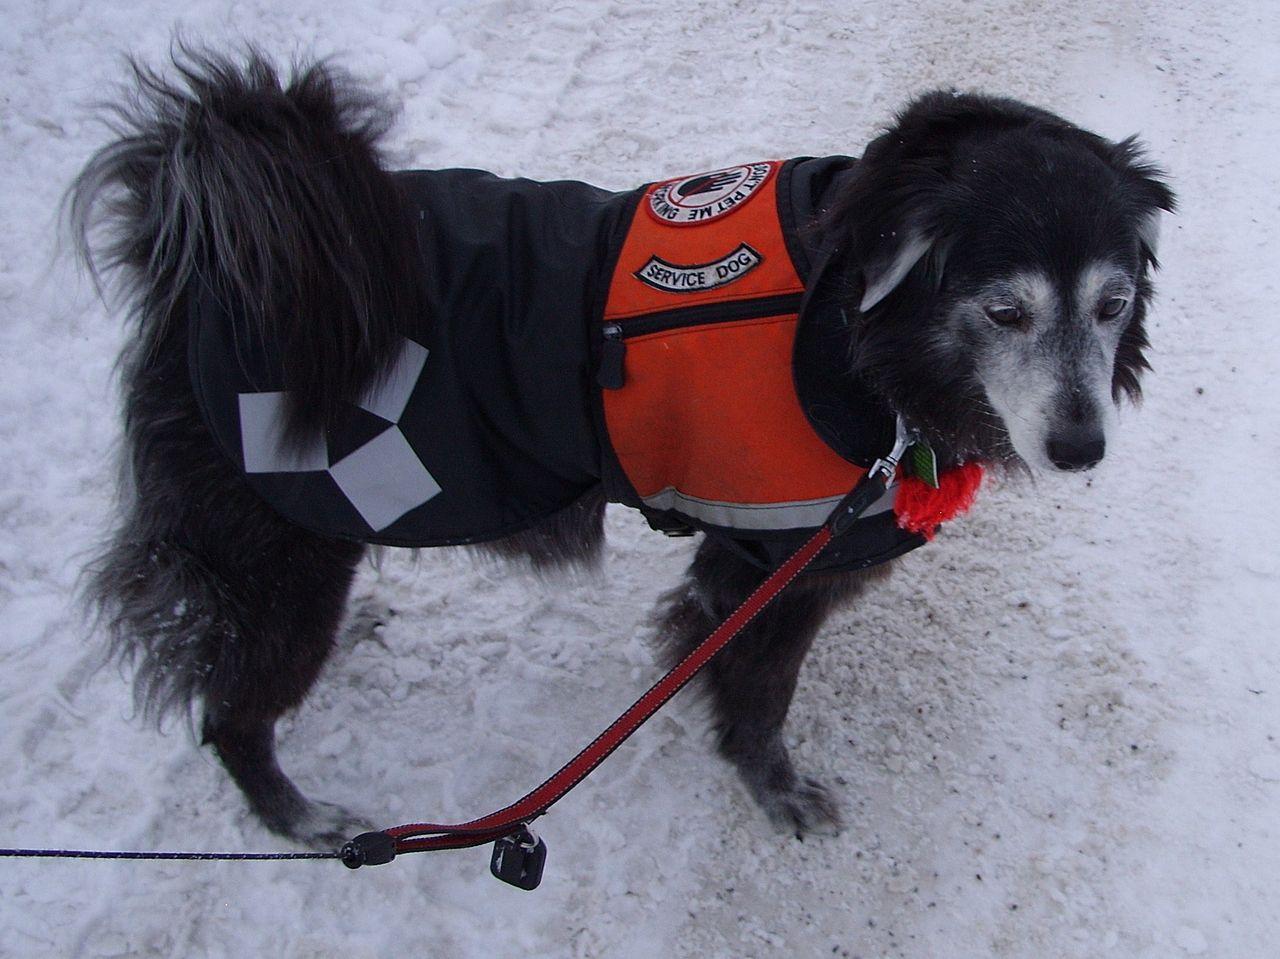 Suzi service dog snow 009.JPG